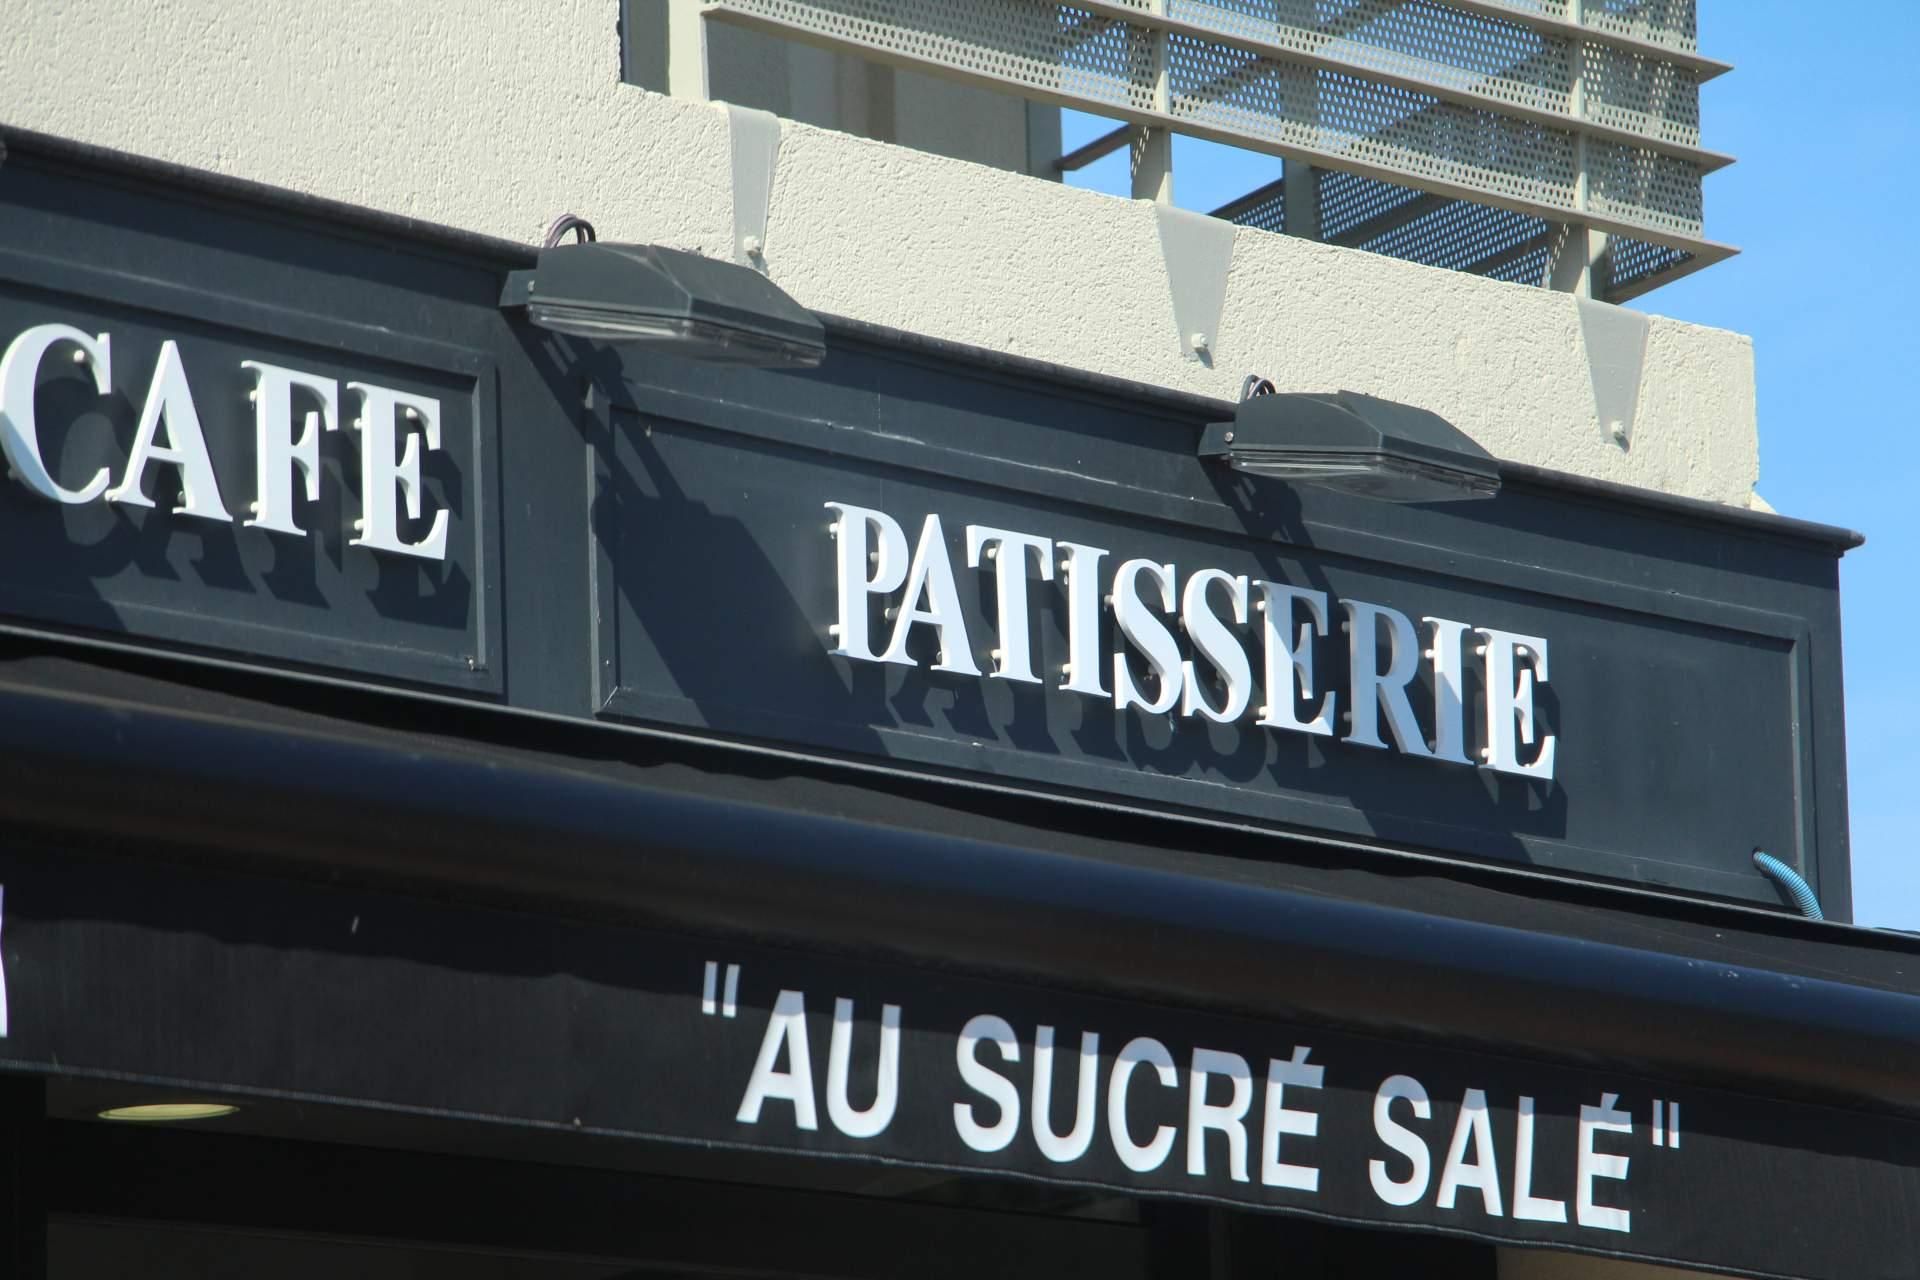 Patisserie in Le Teich